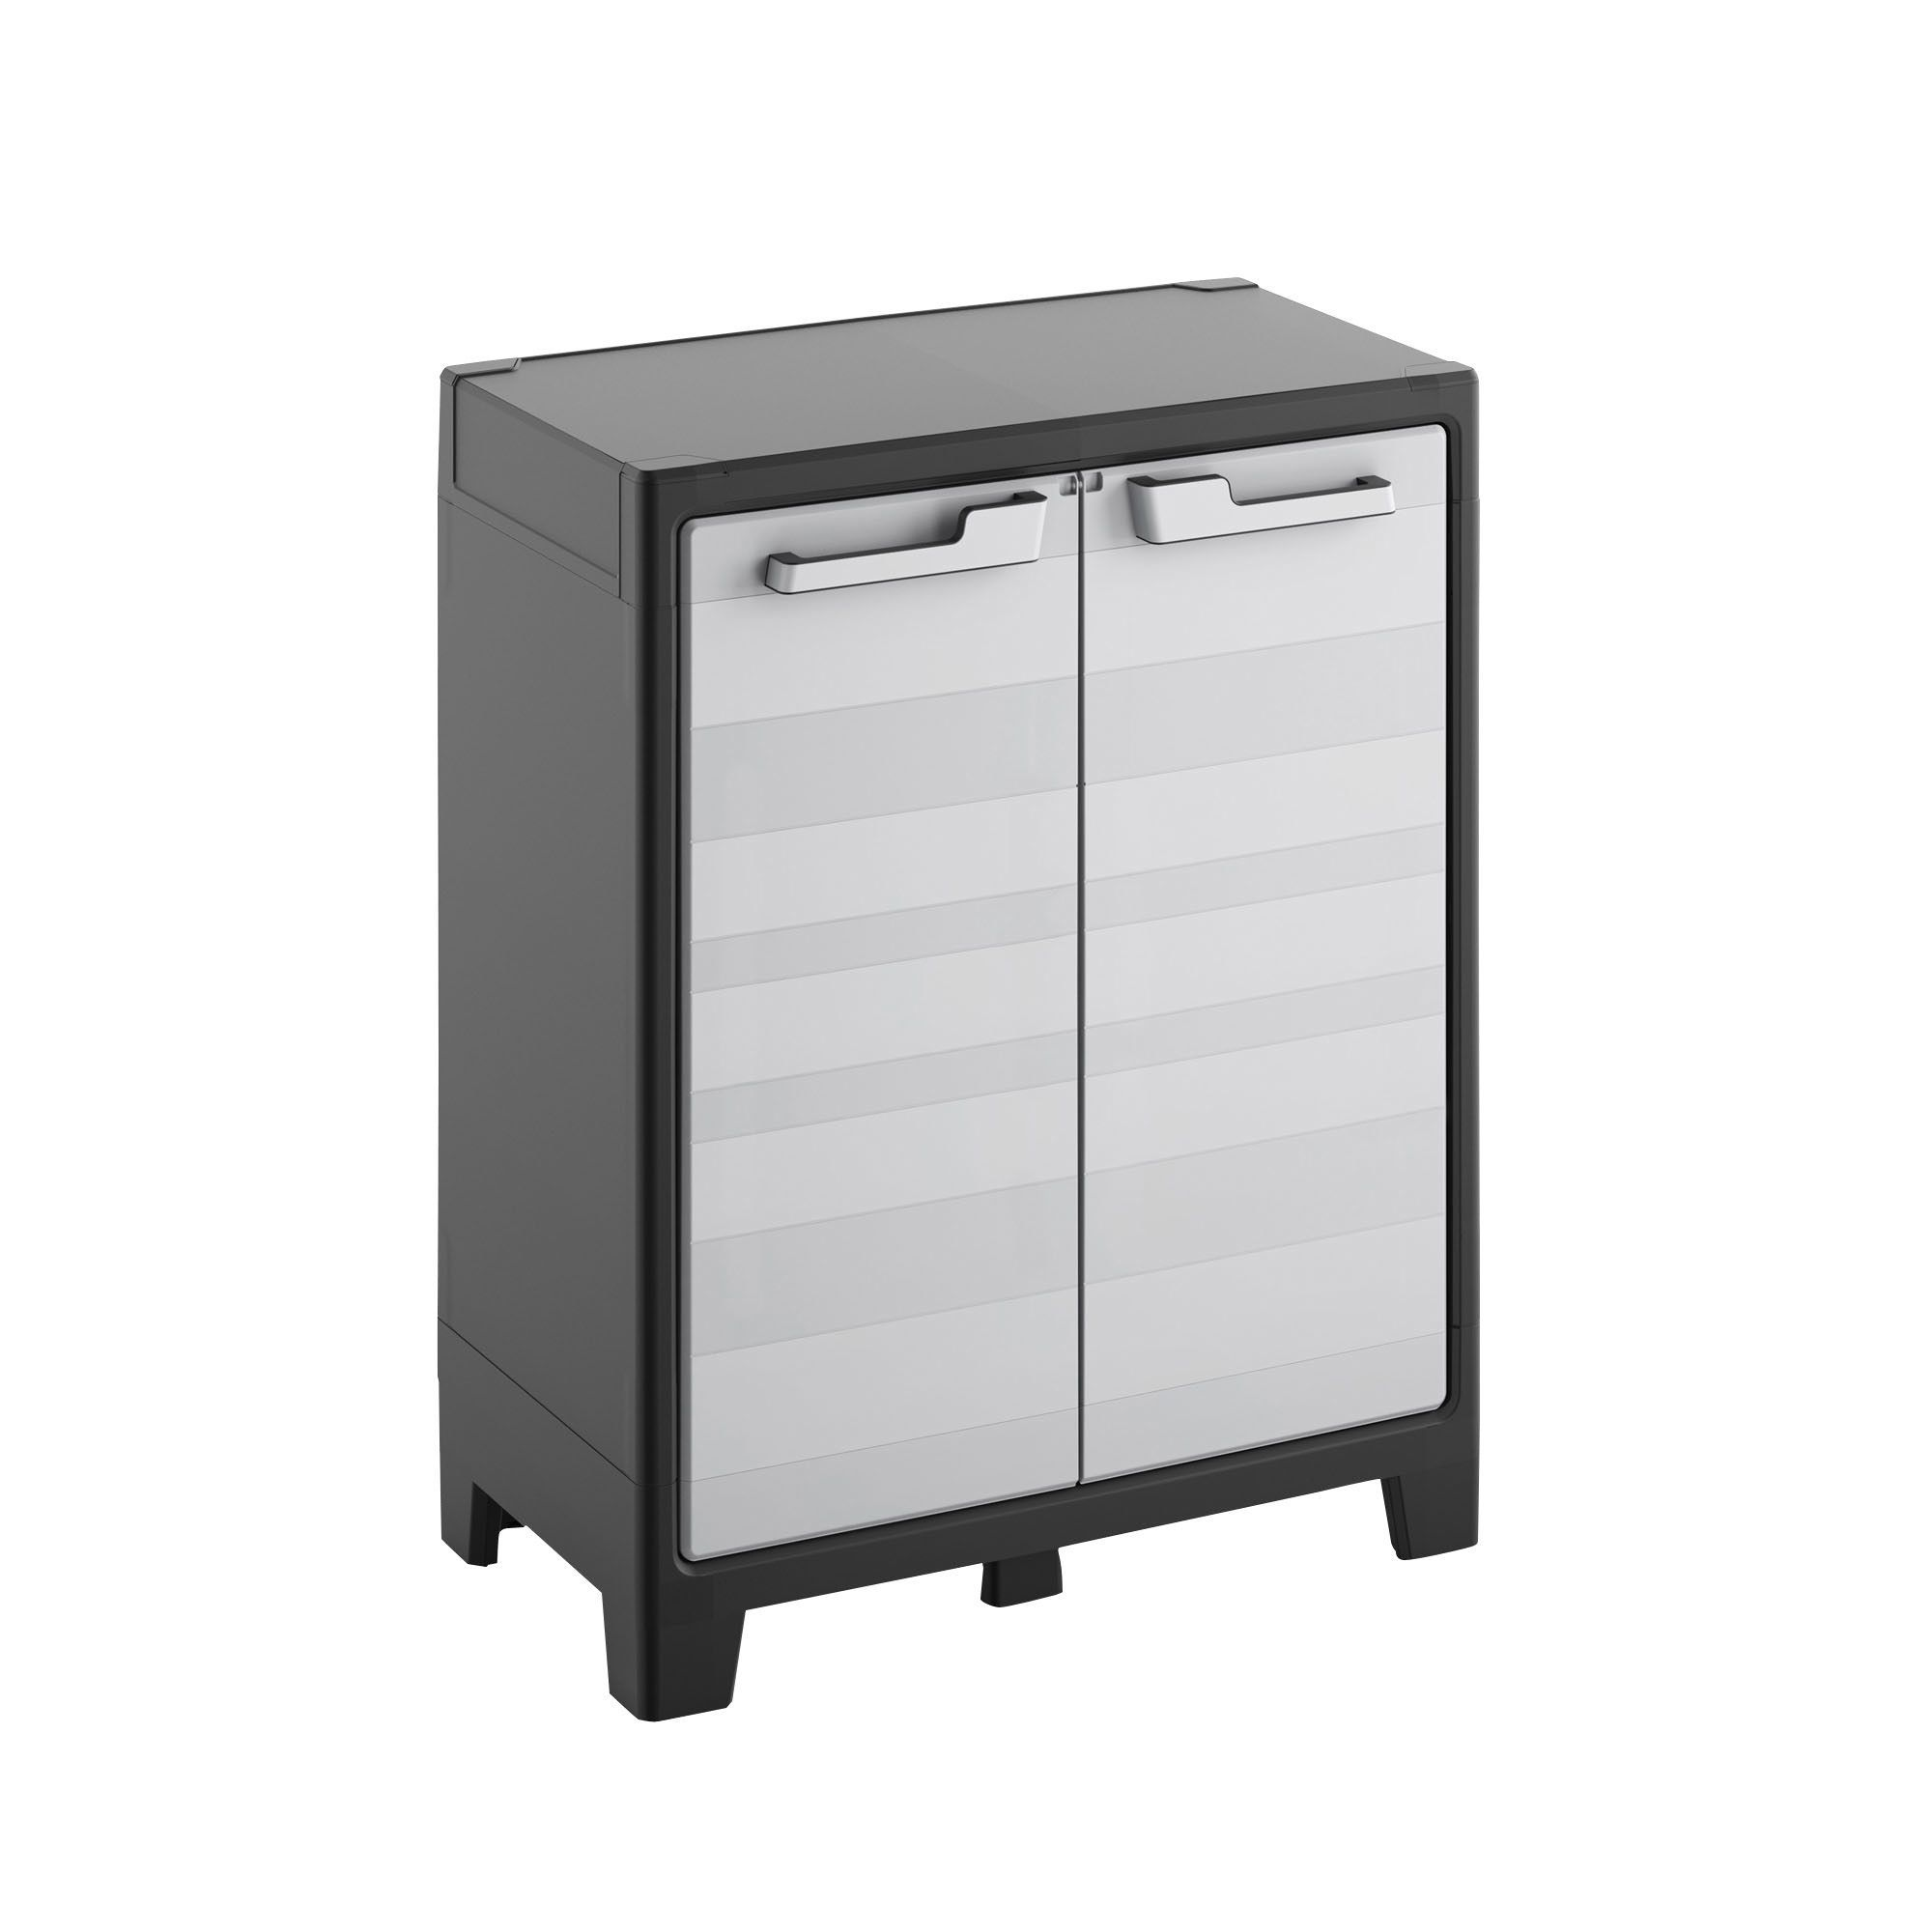 B Q Kitchen Cabinets Sale: Form Flexi-store 2 Shelf Plastic Cabinet